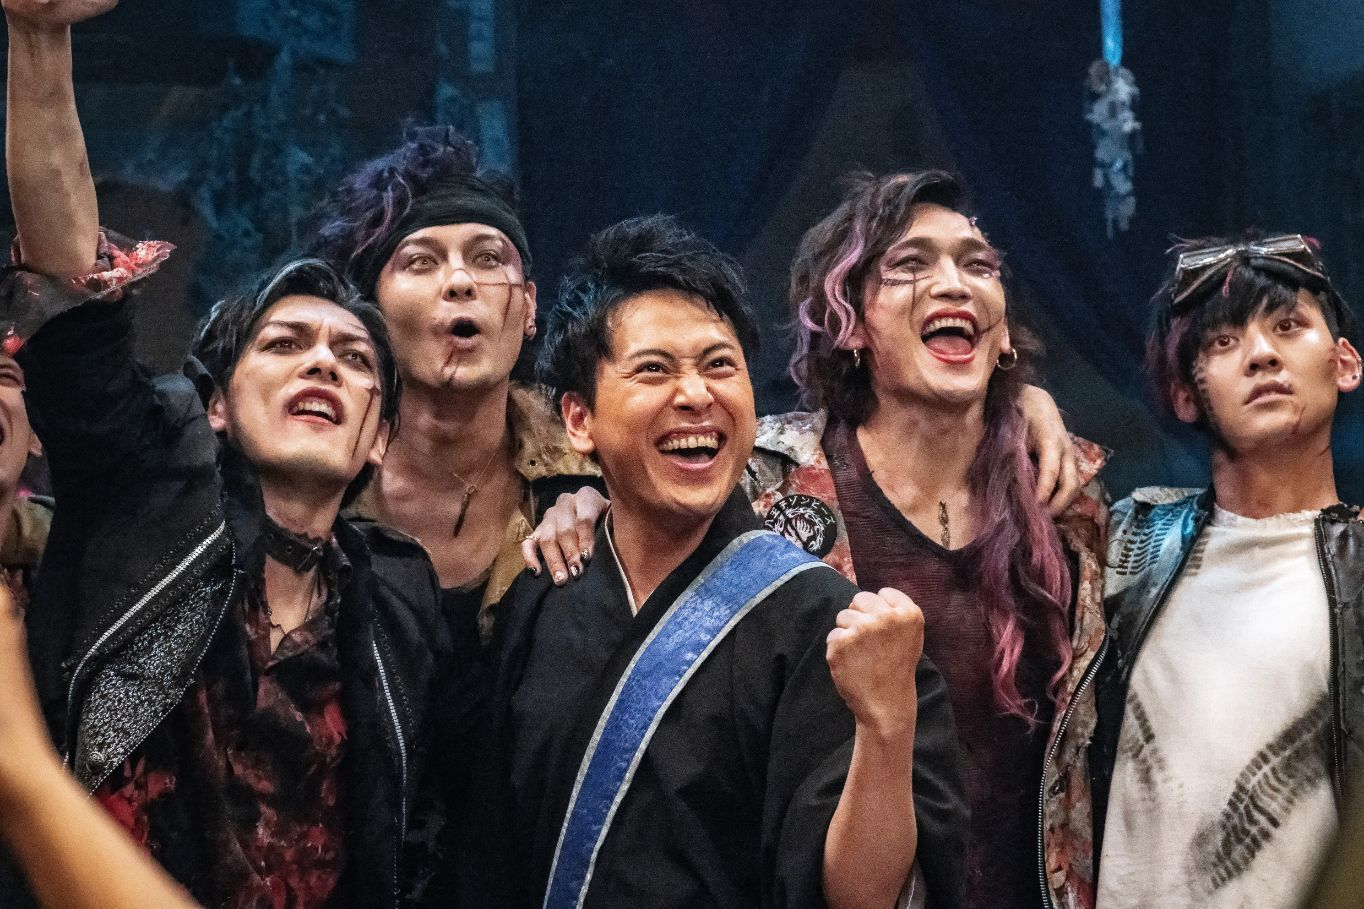 (C)2020映画「八王子ゾンビーズ」製作委員会